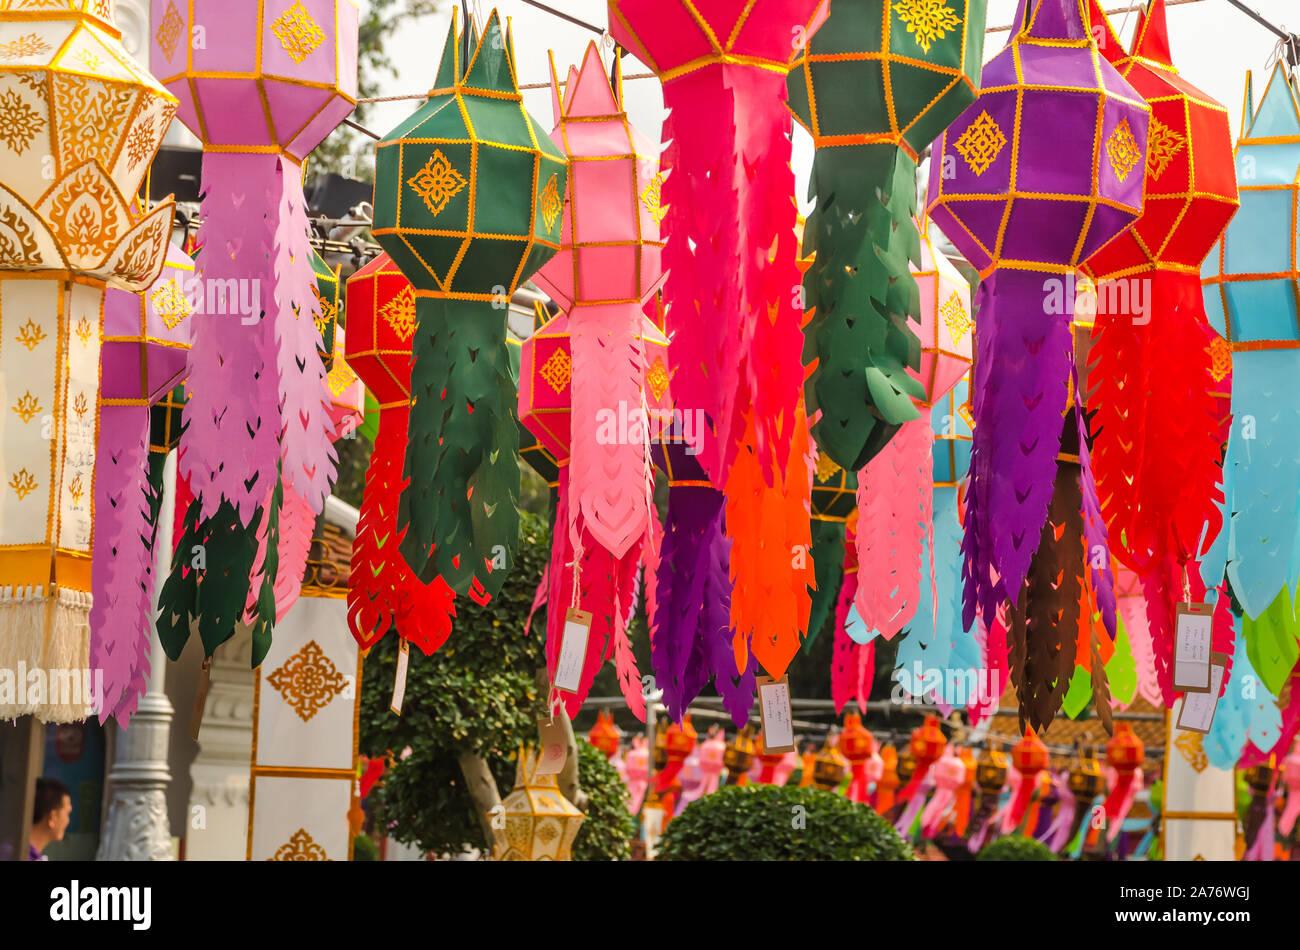 BANGKOK, THAILAND - 22. Dezember 2018: Bunte traditionelle Papier Laterne und hängenden Vorhang Dekoration in Wat Benchamabophit Buddha Tempel, Bangkok. Stockfoto